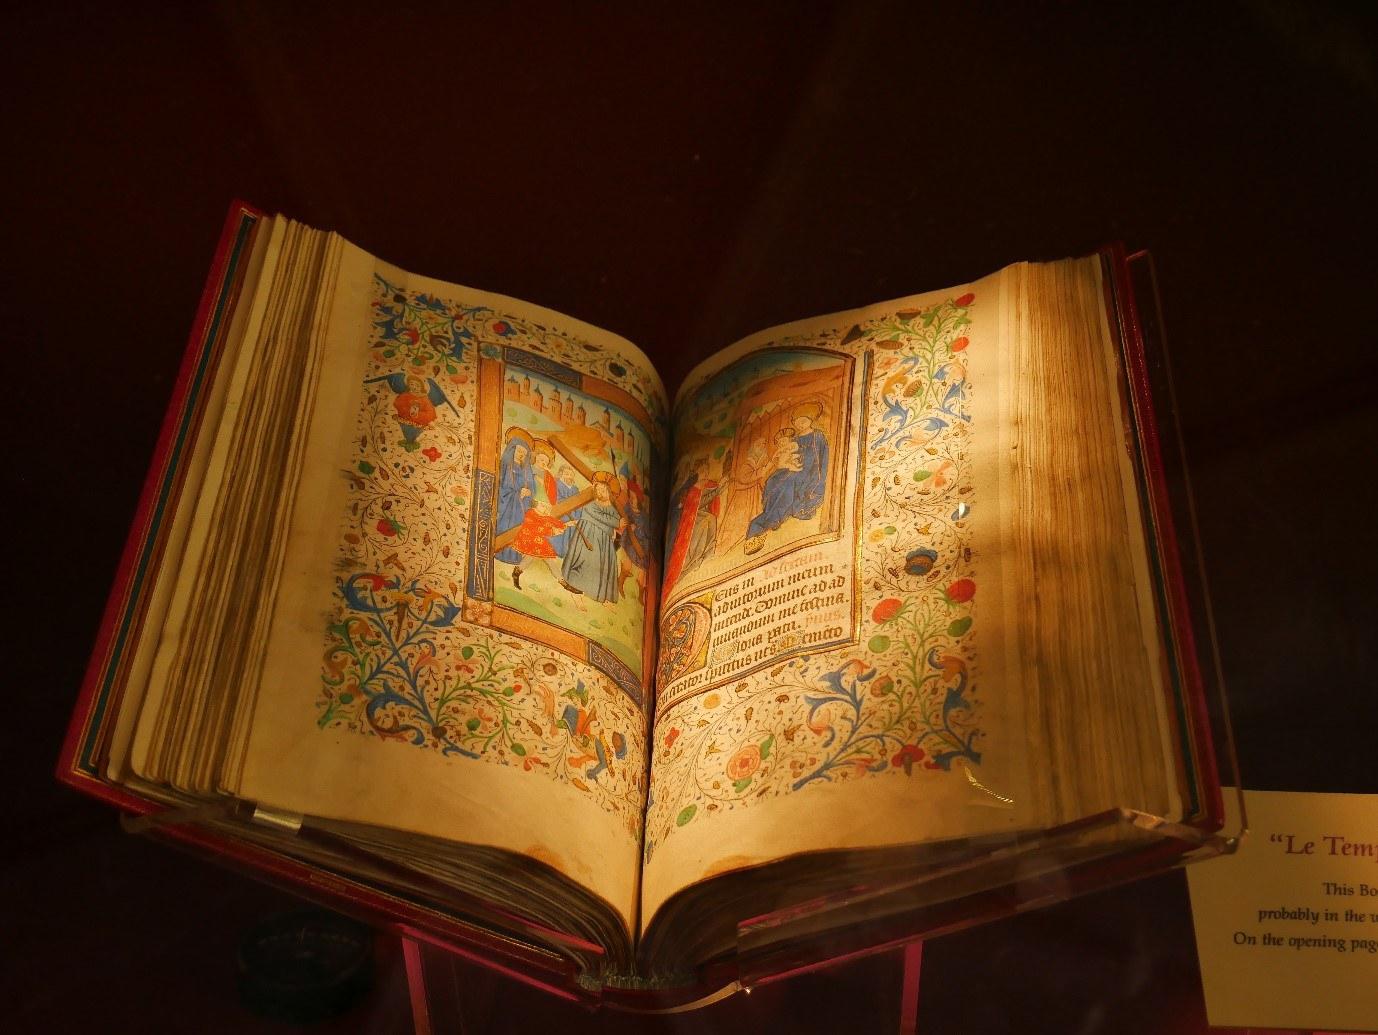 Anne Boleyn'S Book Of Hours © Tudor Times Ltd 2019